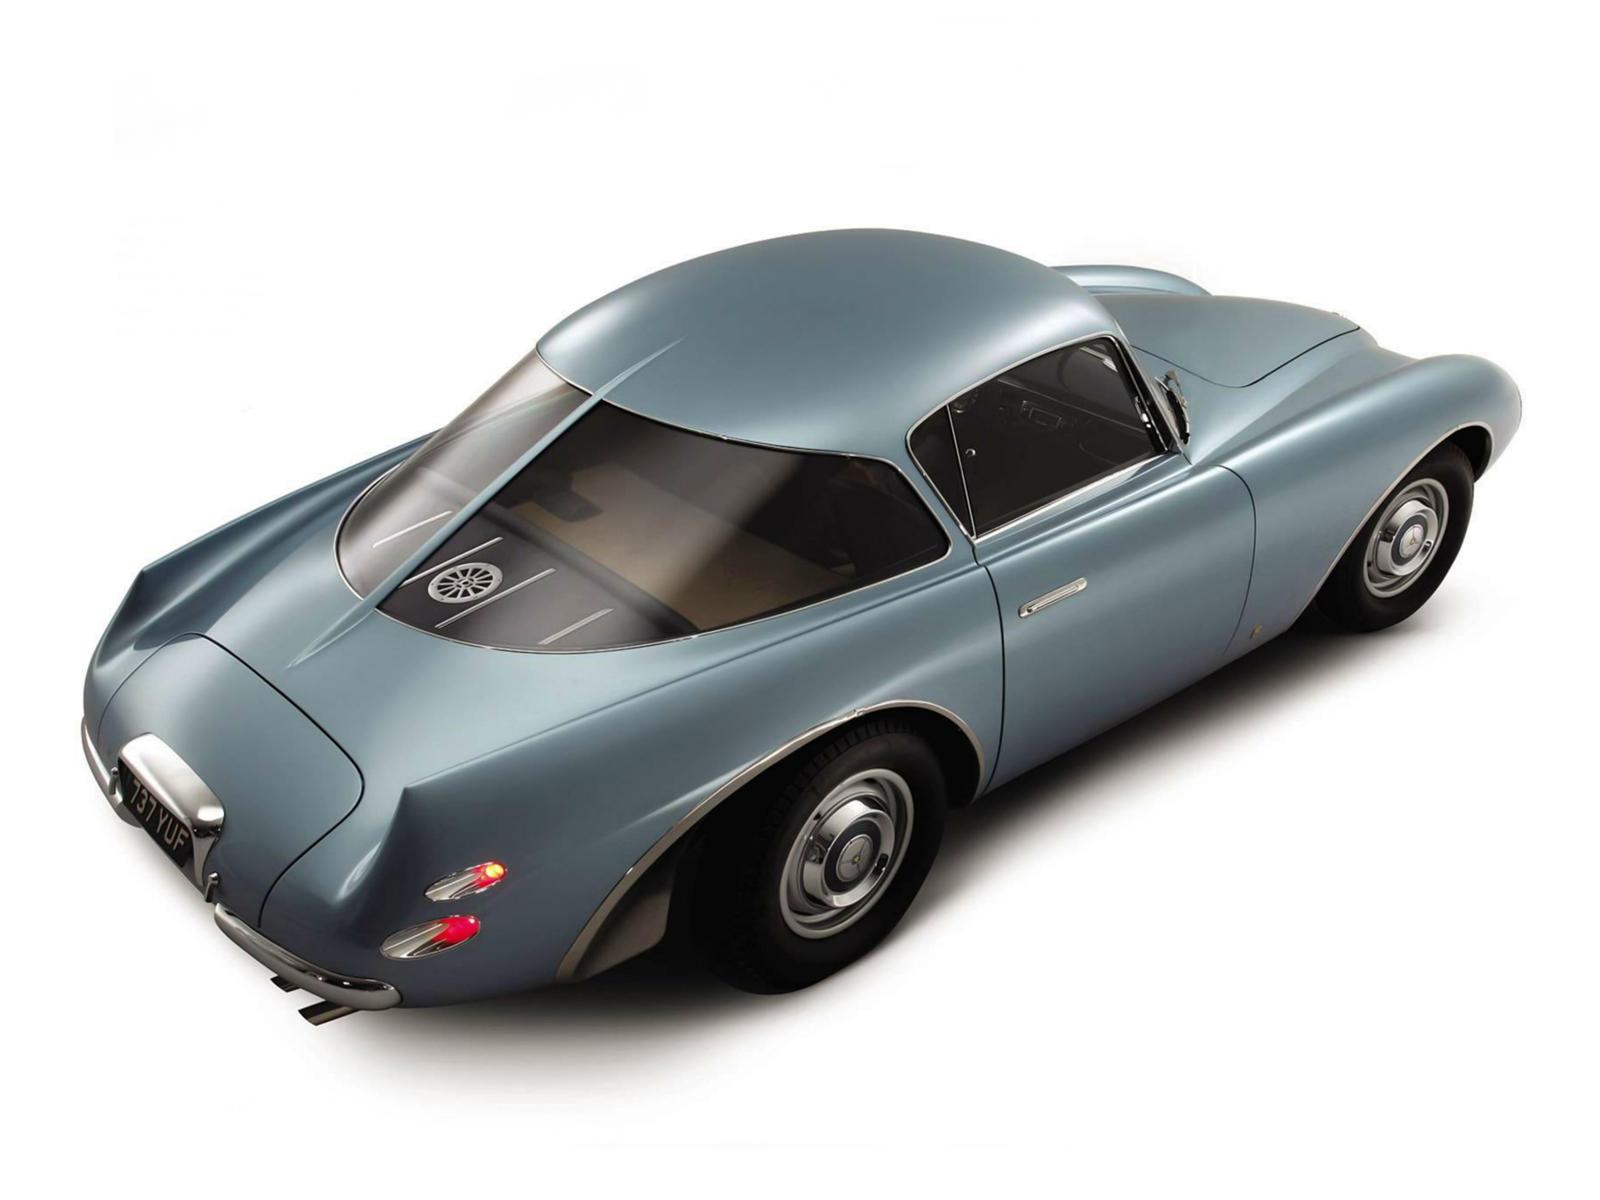 1952 Abarth 1500 Coupe Biposto Bertone Студии